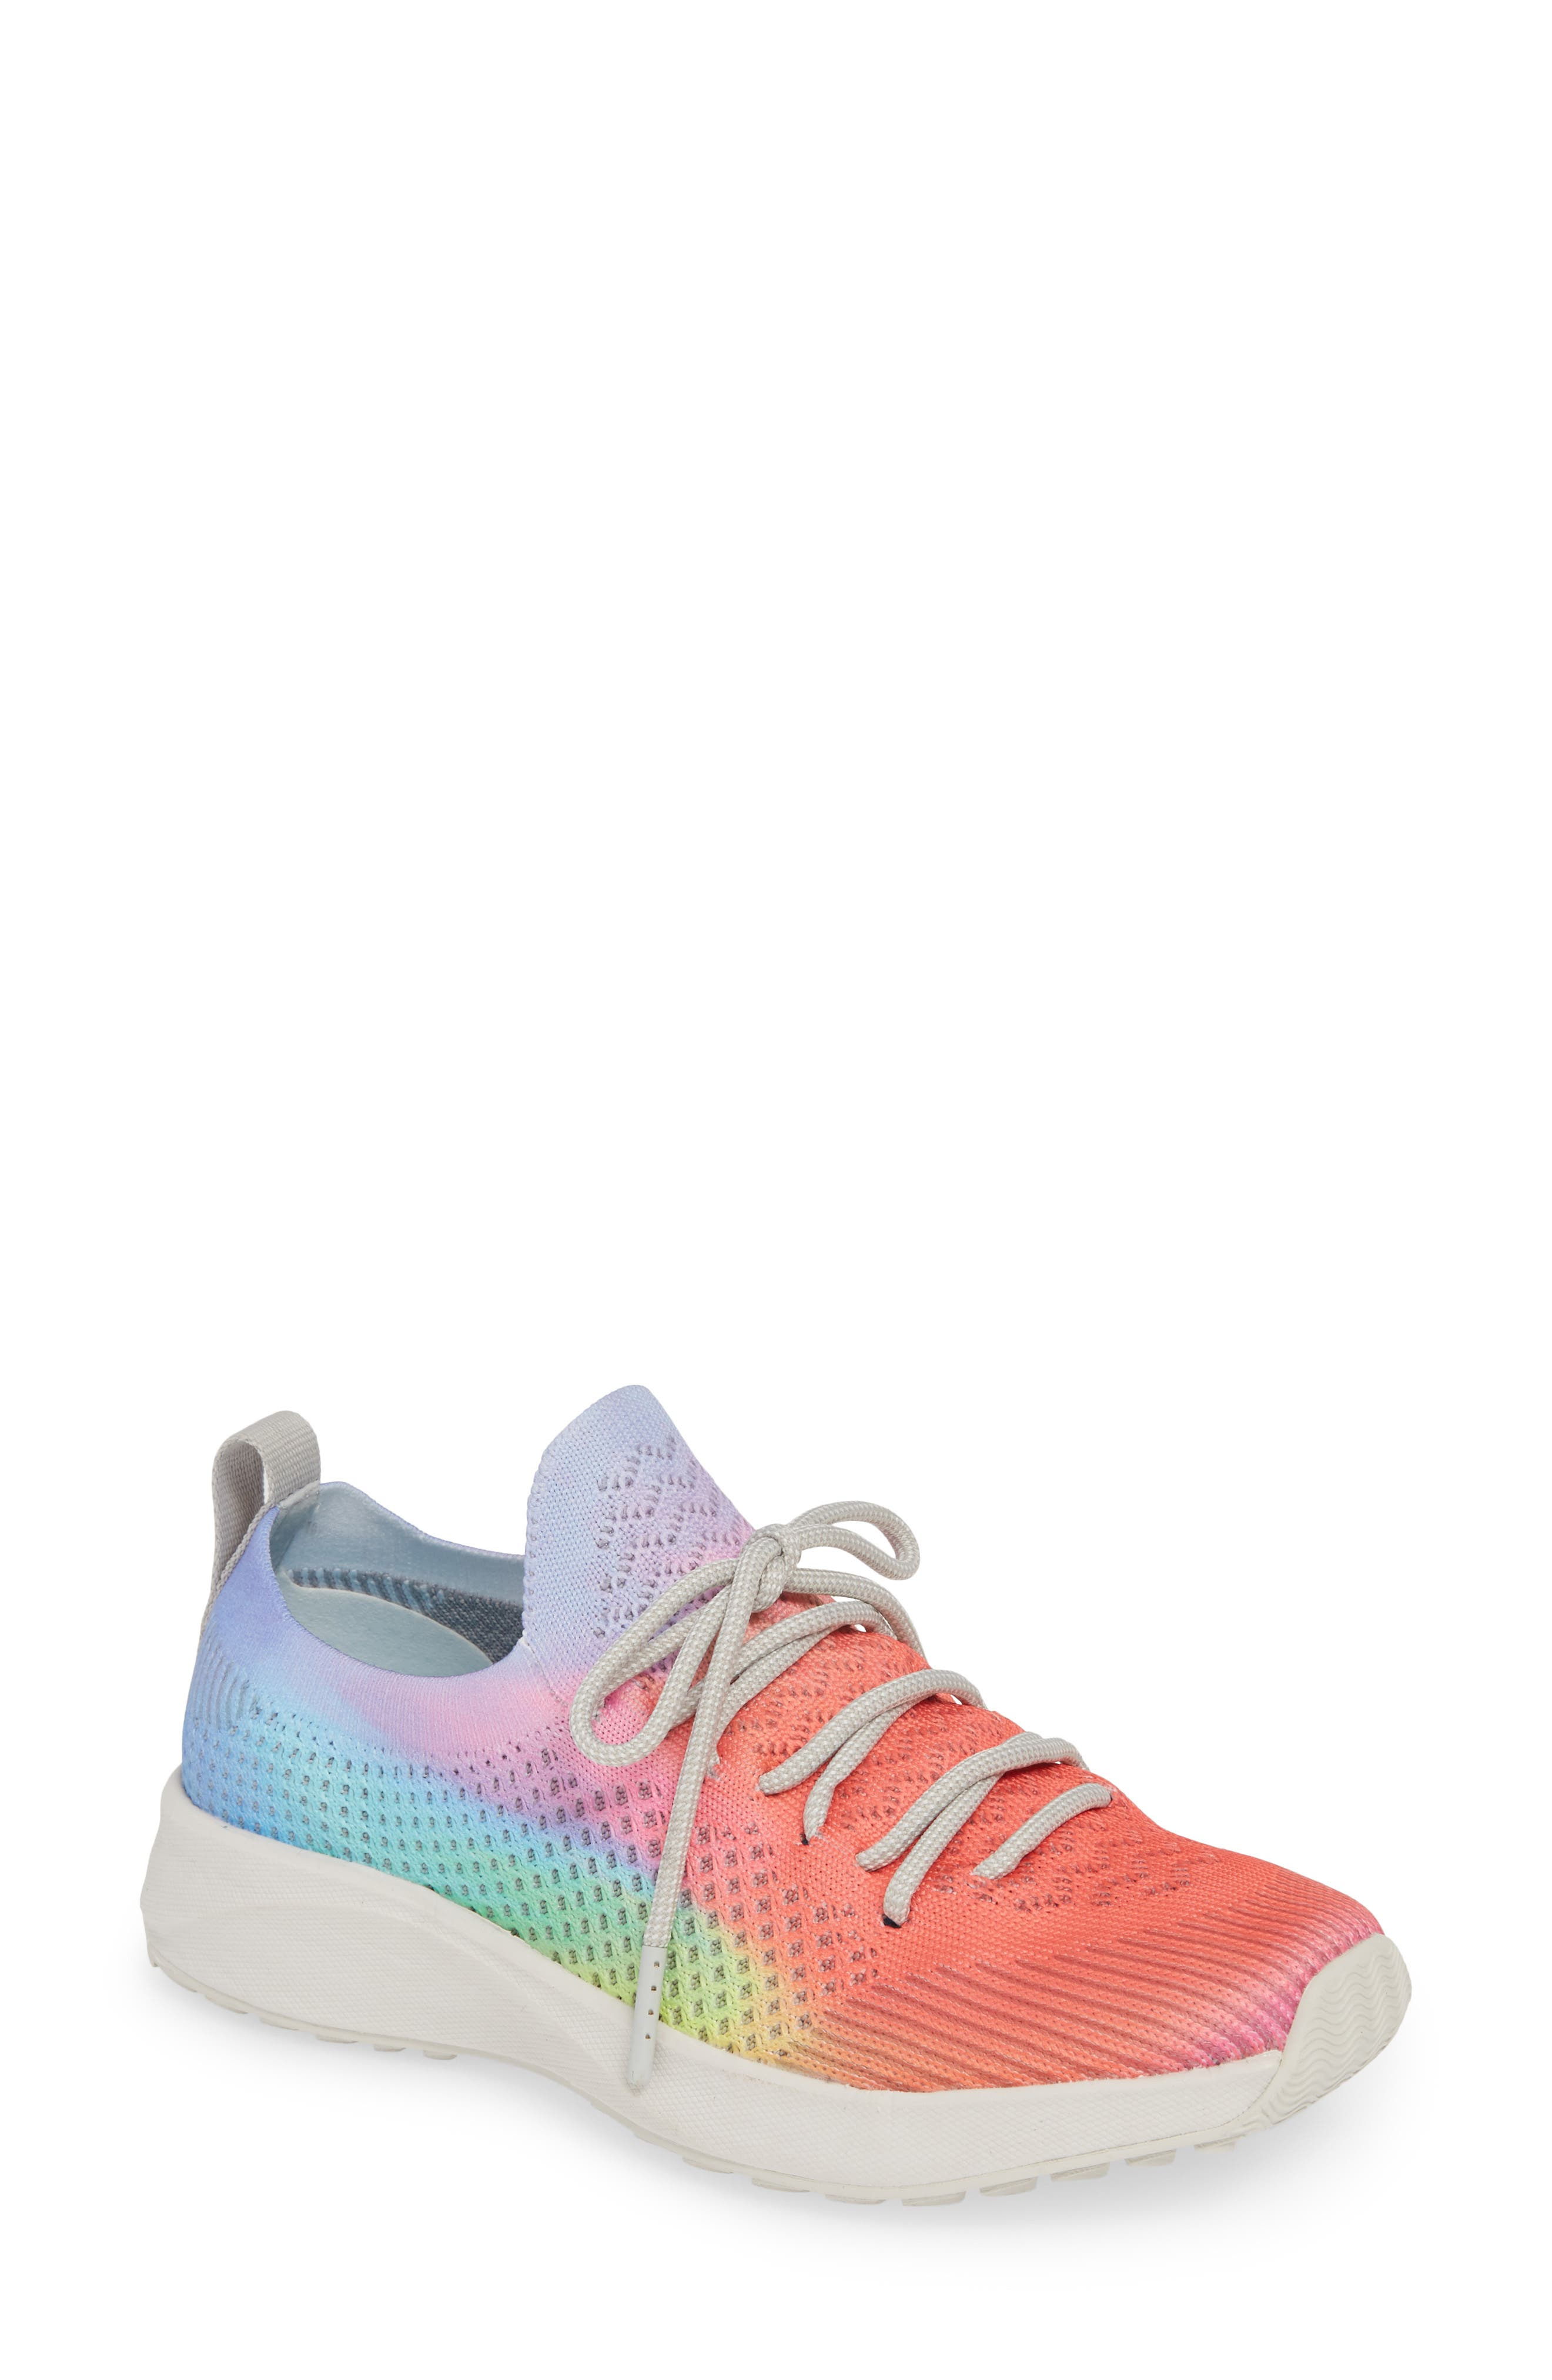 Native Shoes Mercury 2.0 Liteknit Sneaker